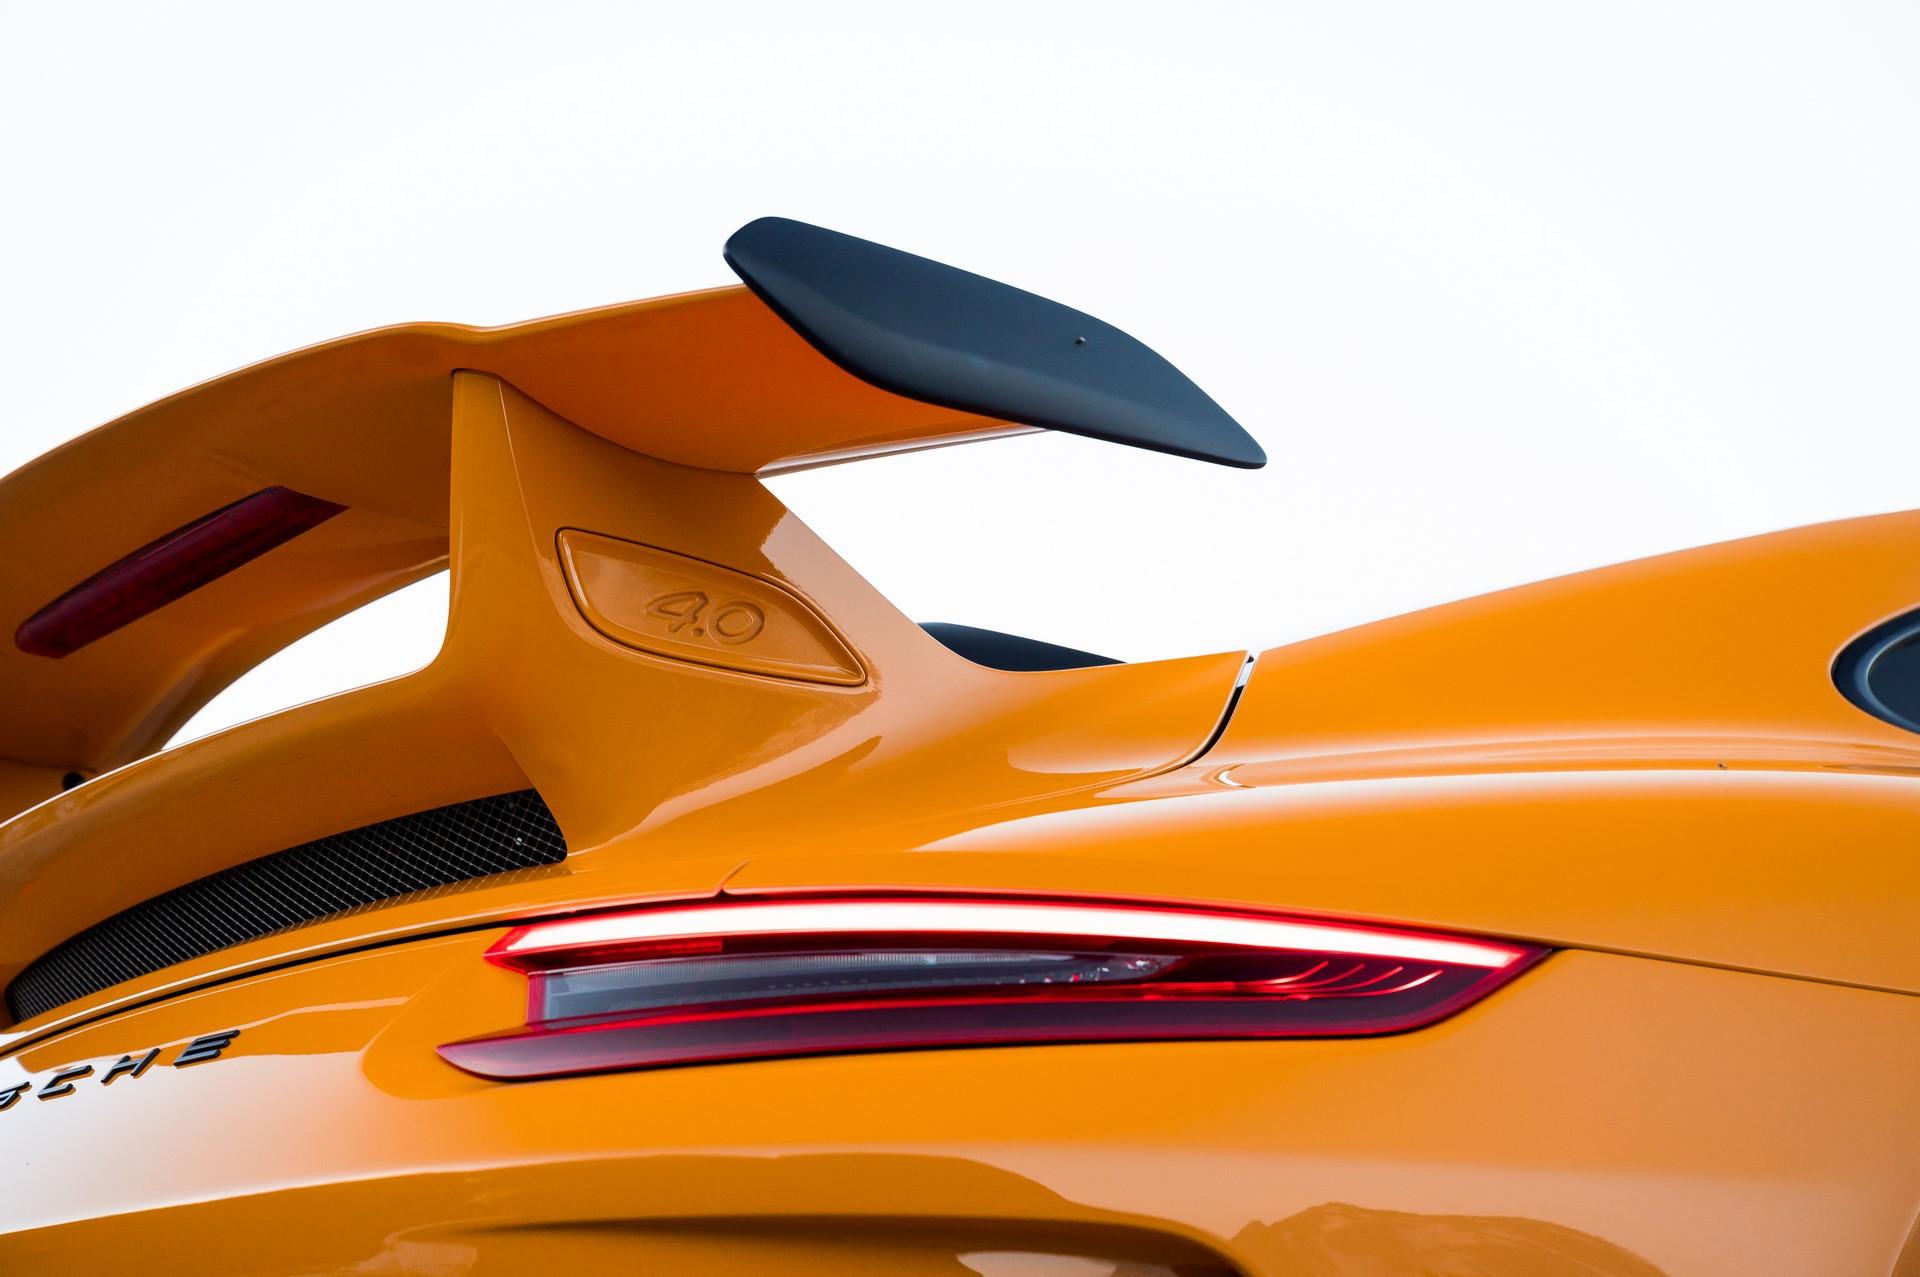 20-years-of-the-Porsche-911-GT3-43